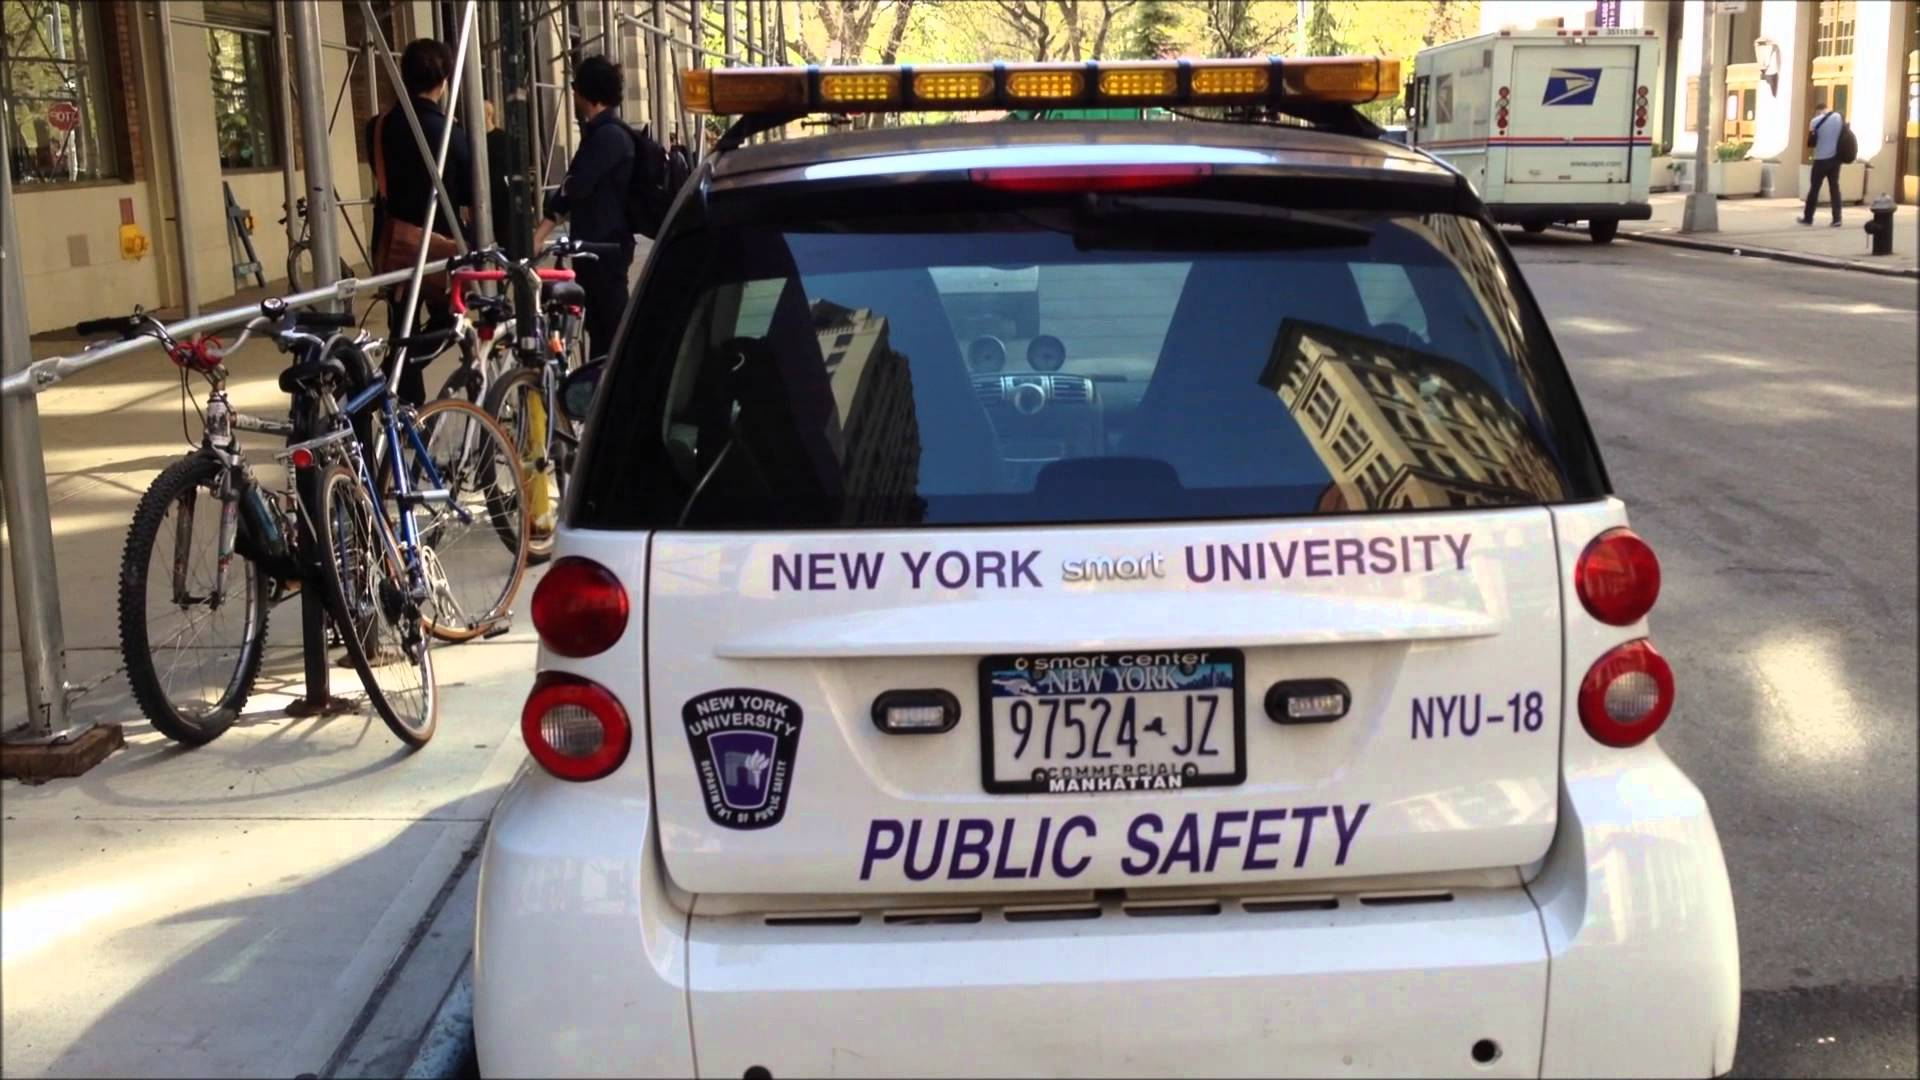 Nyu police